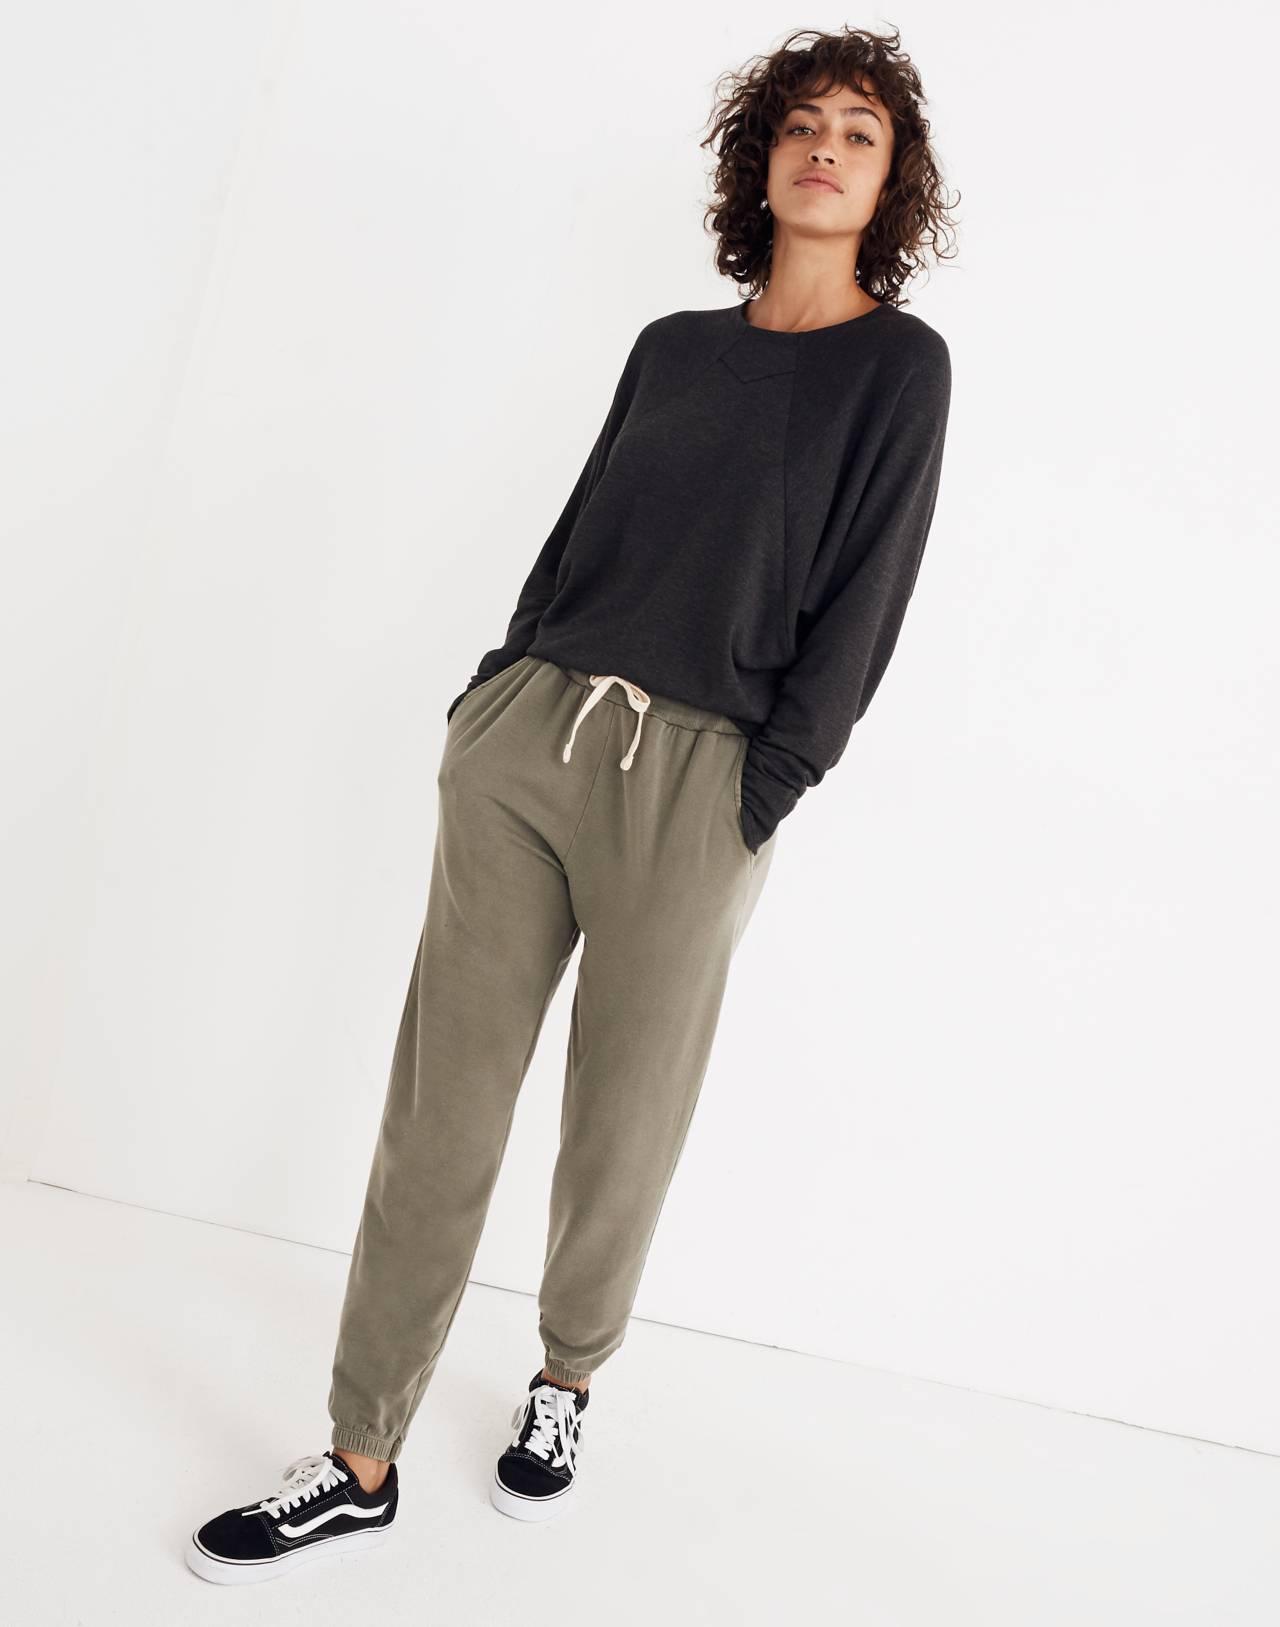 Splits59™ Jillian Pullover Top in heather grey image 3